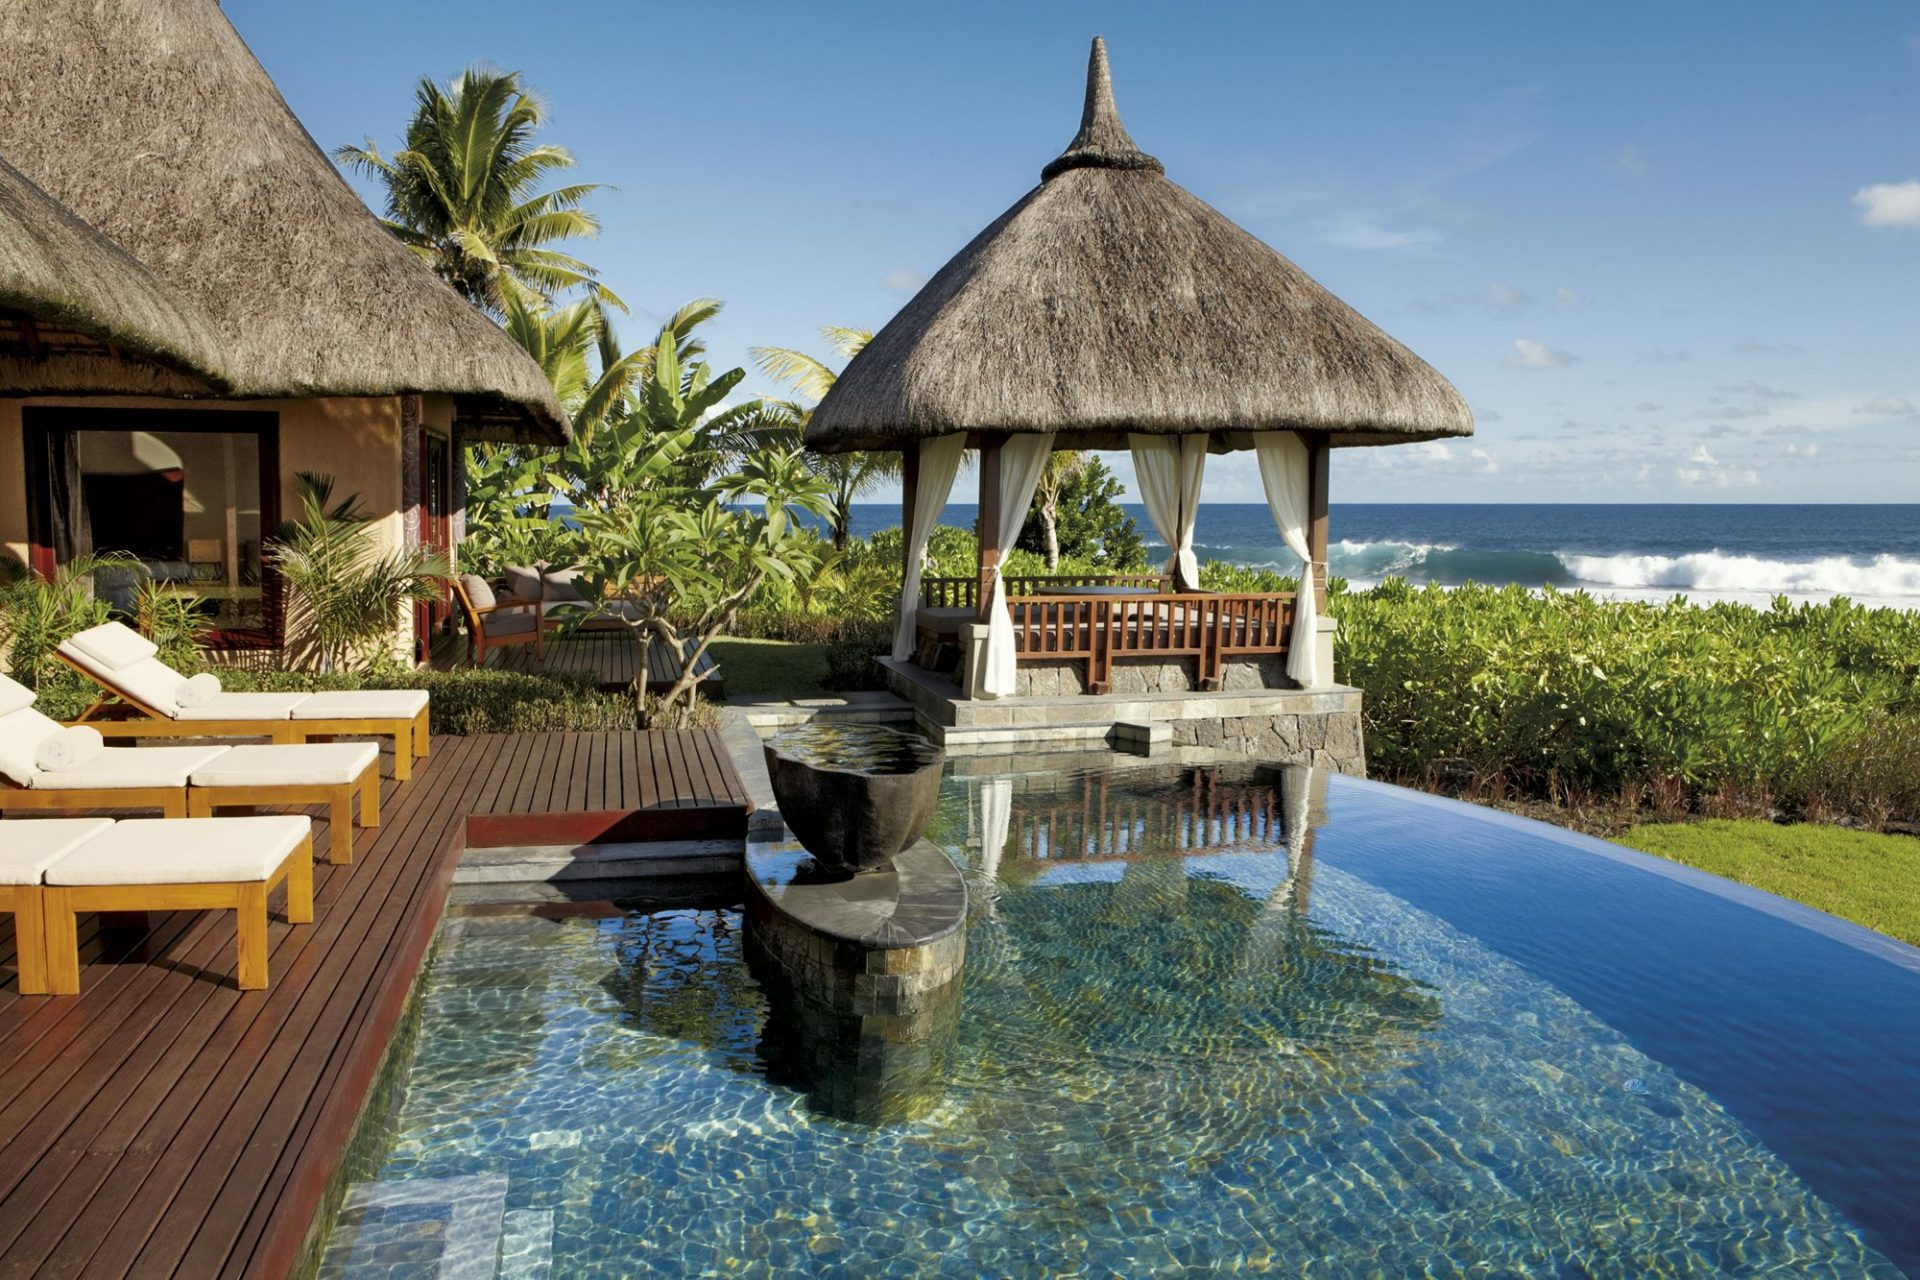 mauritius, isola, hotel, resort, spa, lusso, tropicale, oceano